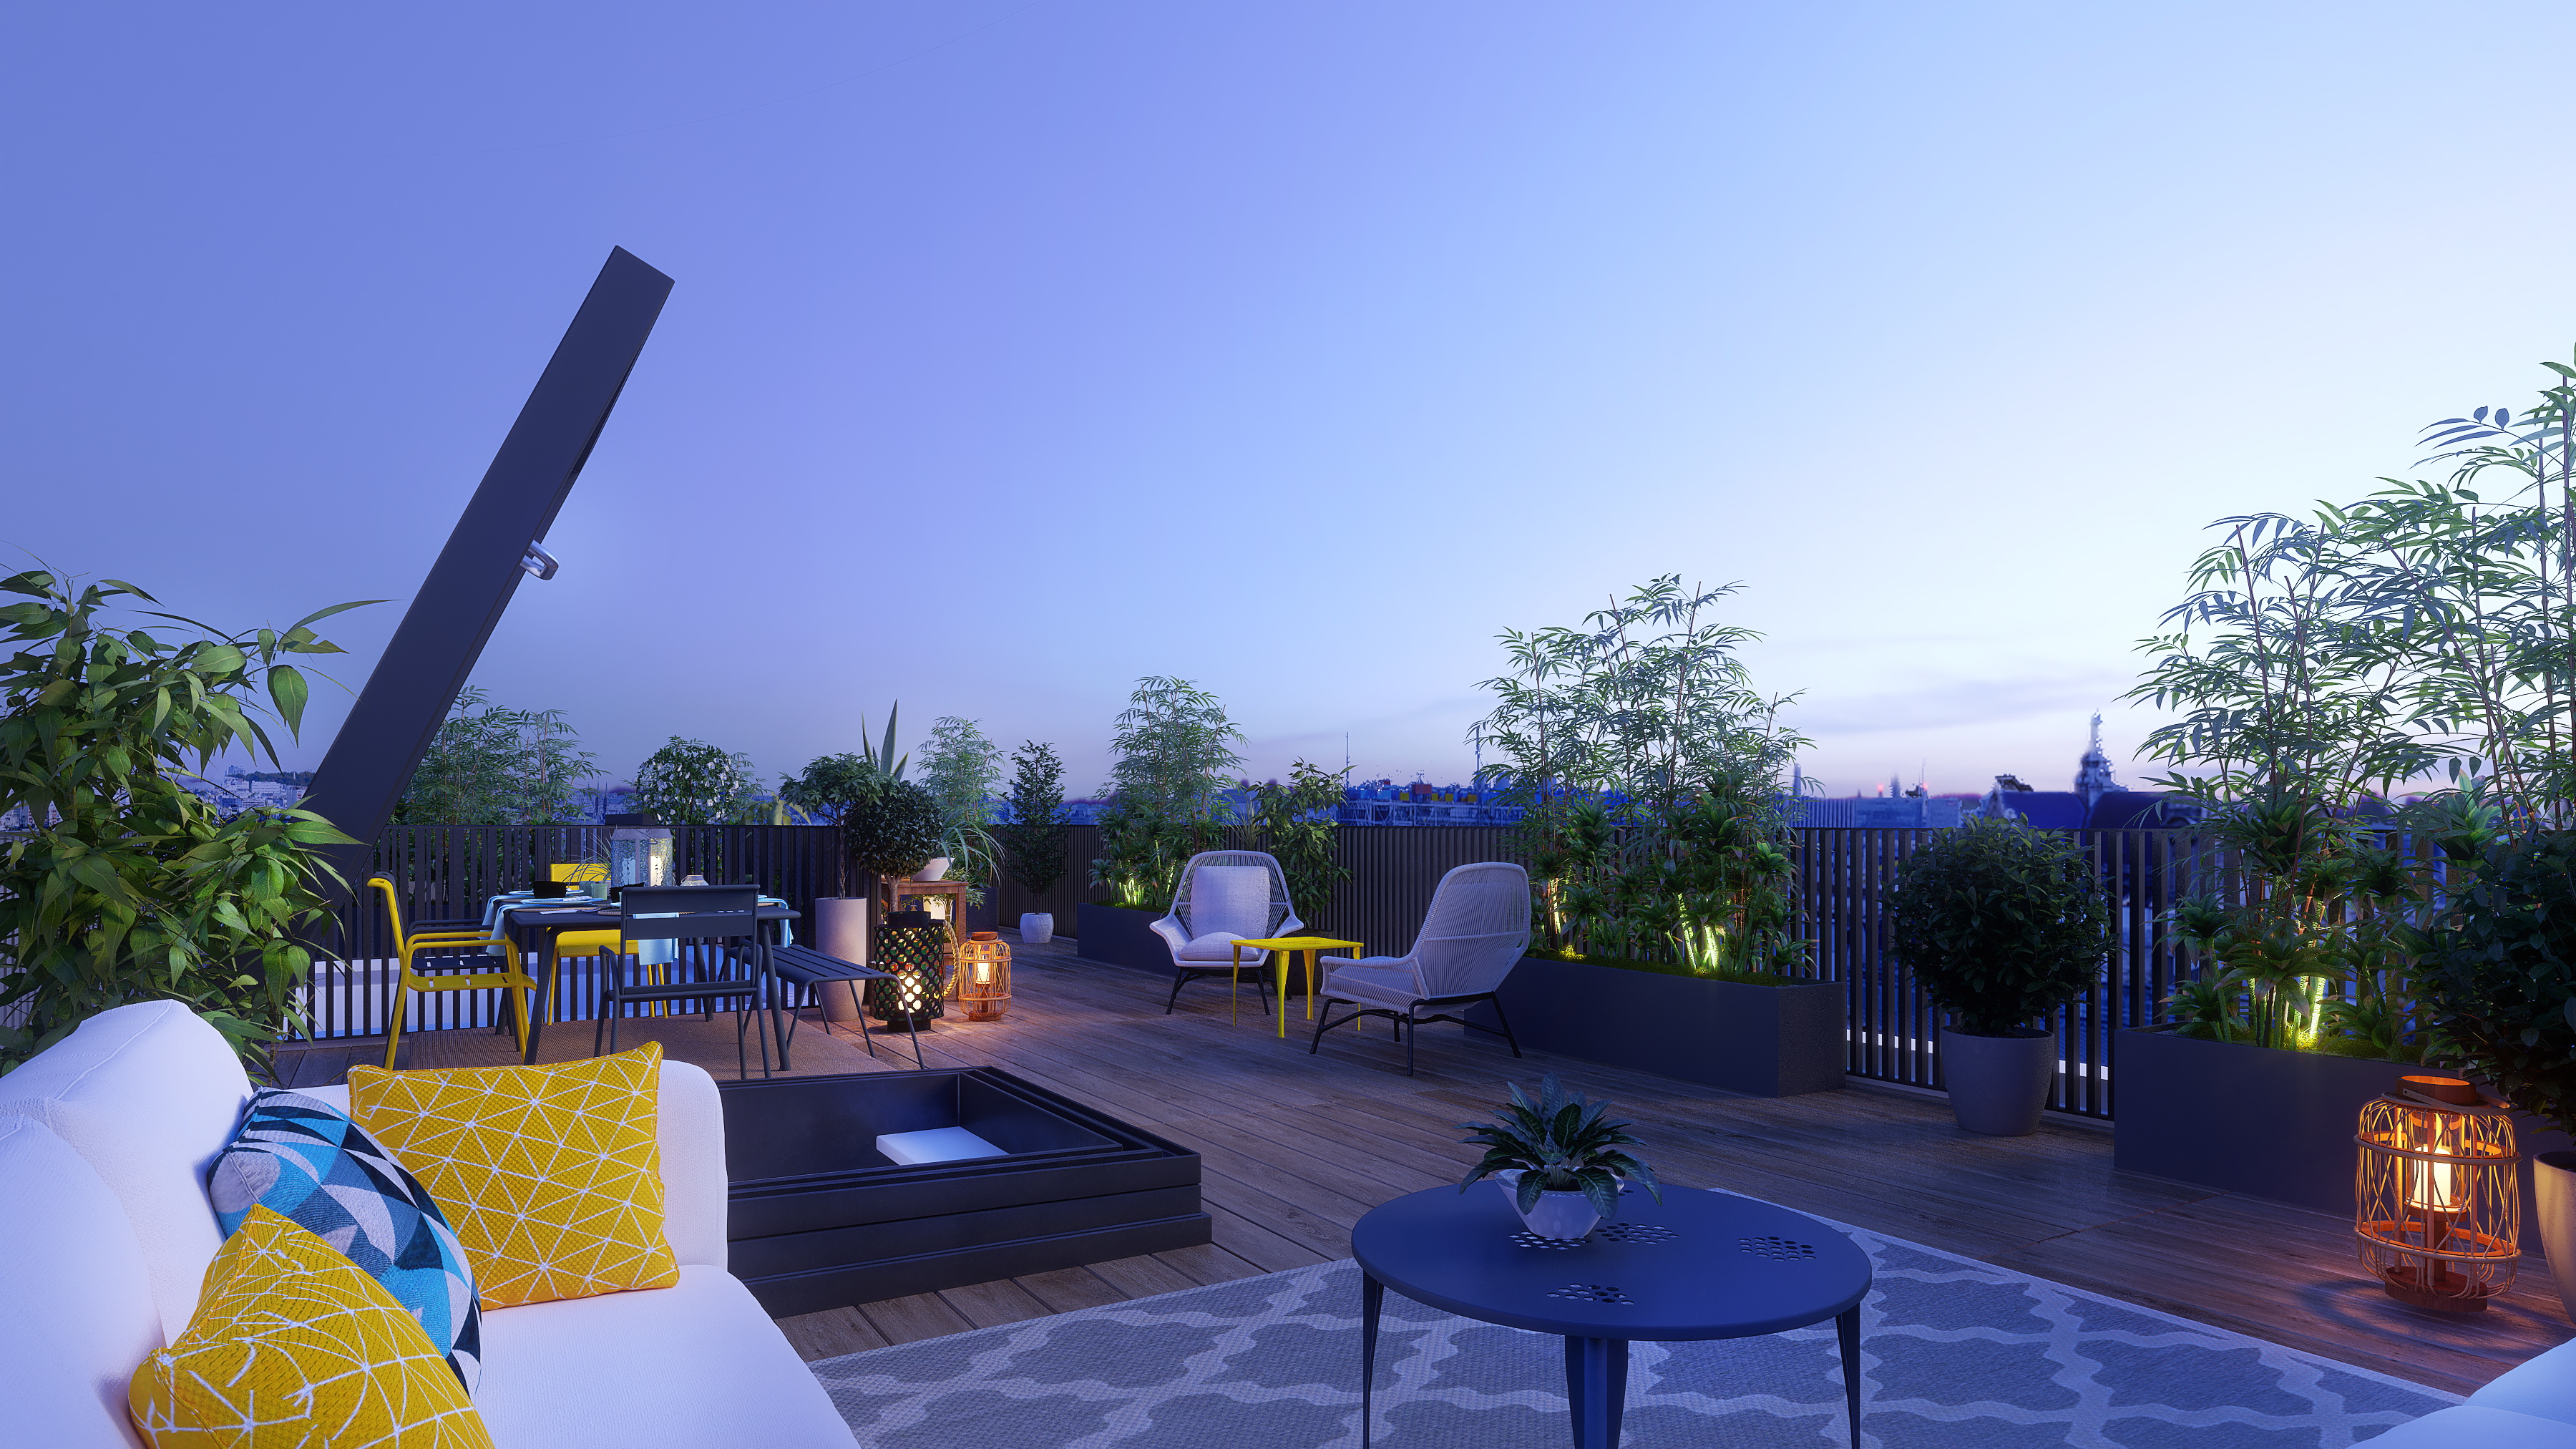 002_RichardLenoir_Rooftop_001HD